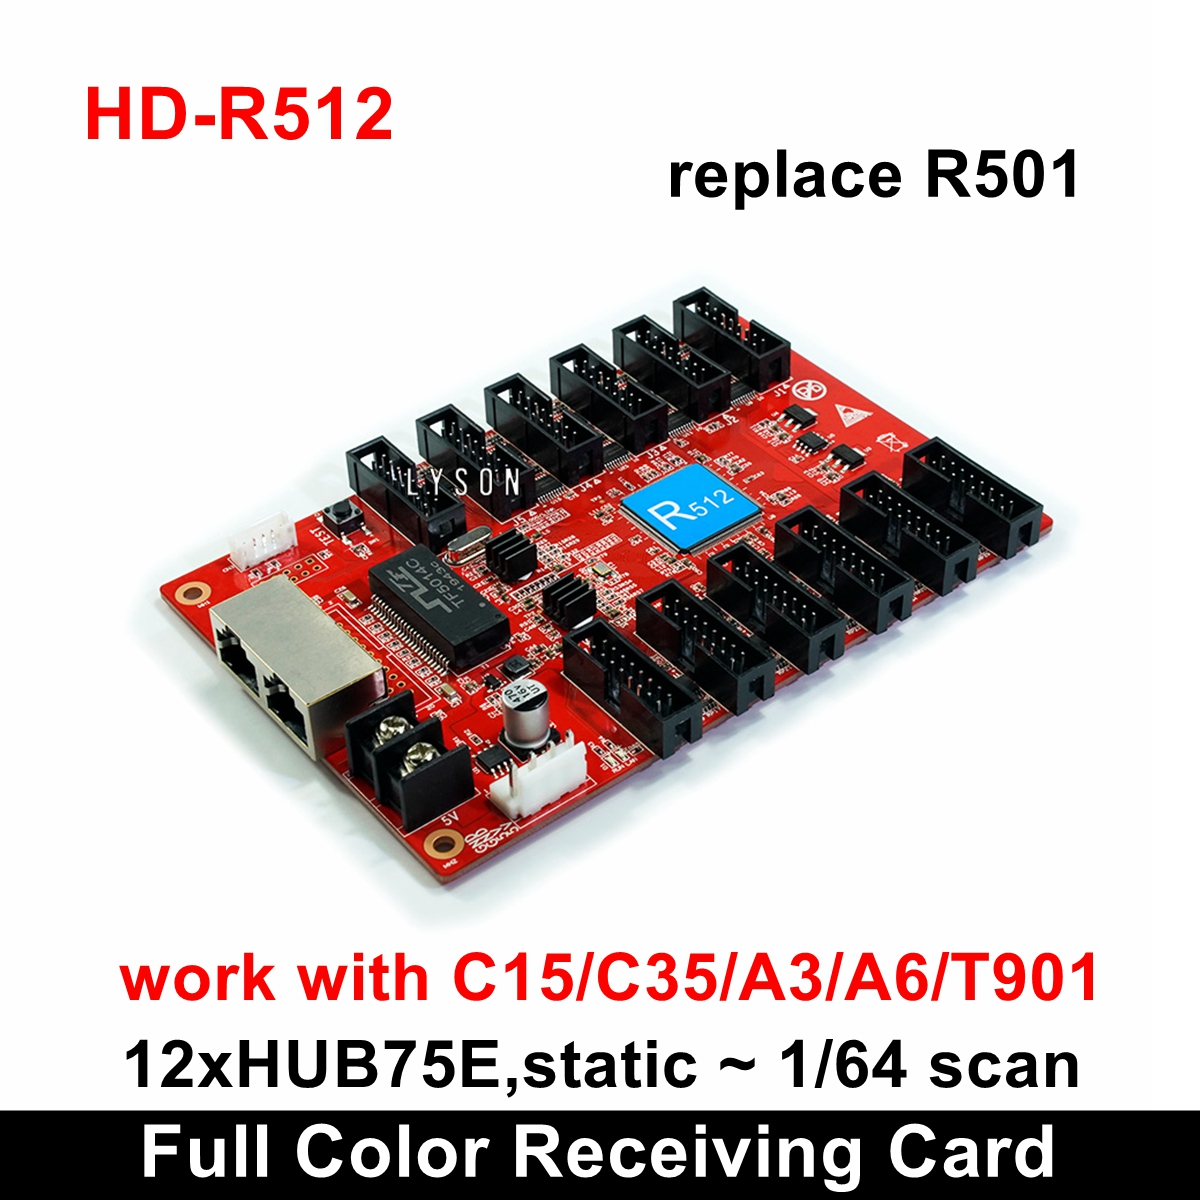 Huidu HD-R512 Full Color Receiving Card Replace Old HD-R501 Work With HD-C15C HD-C35C HD-A3 HD-T901 Sending